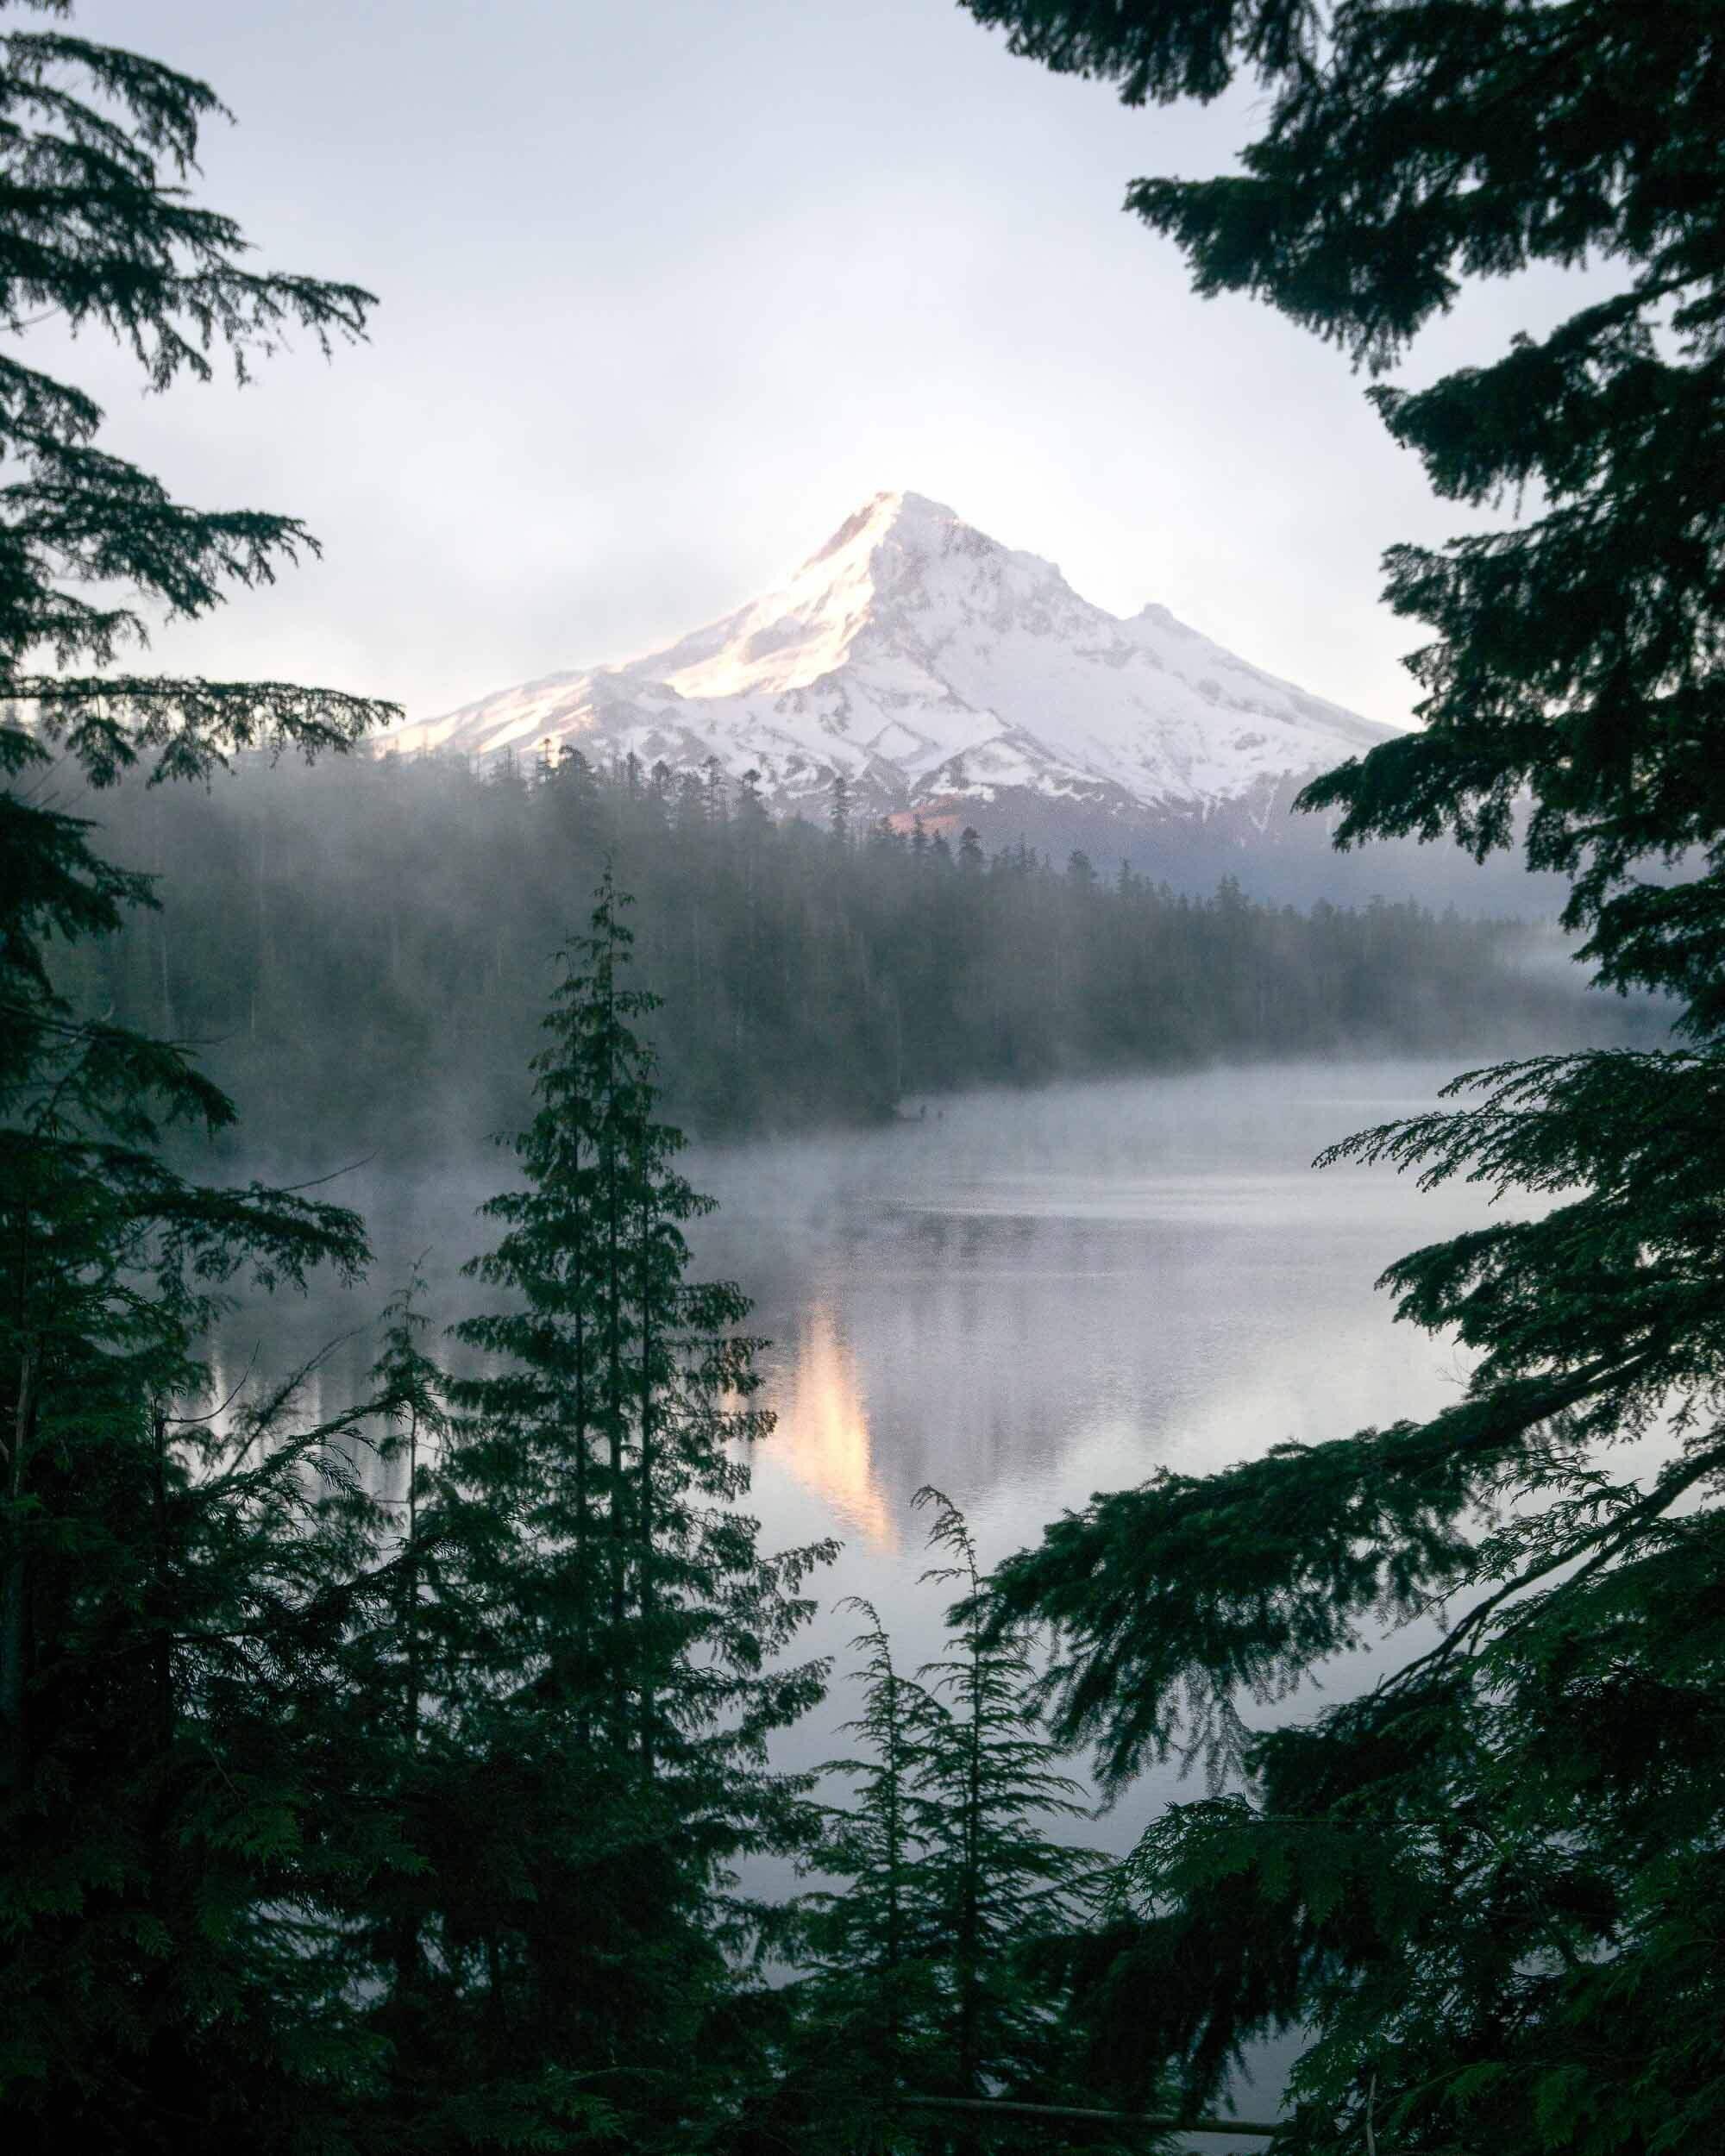 Lost Lake at Mount Hood, Oregon.